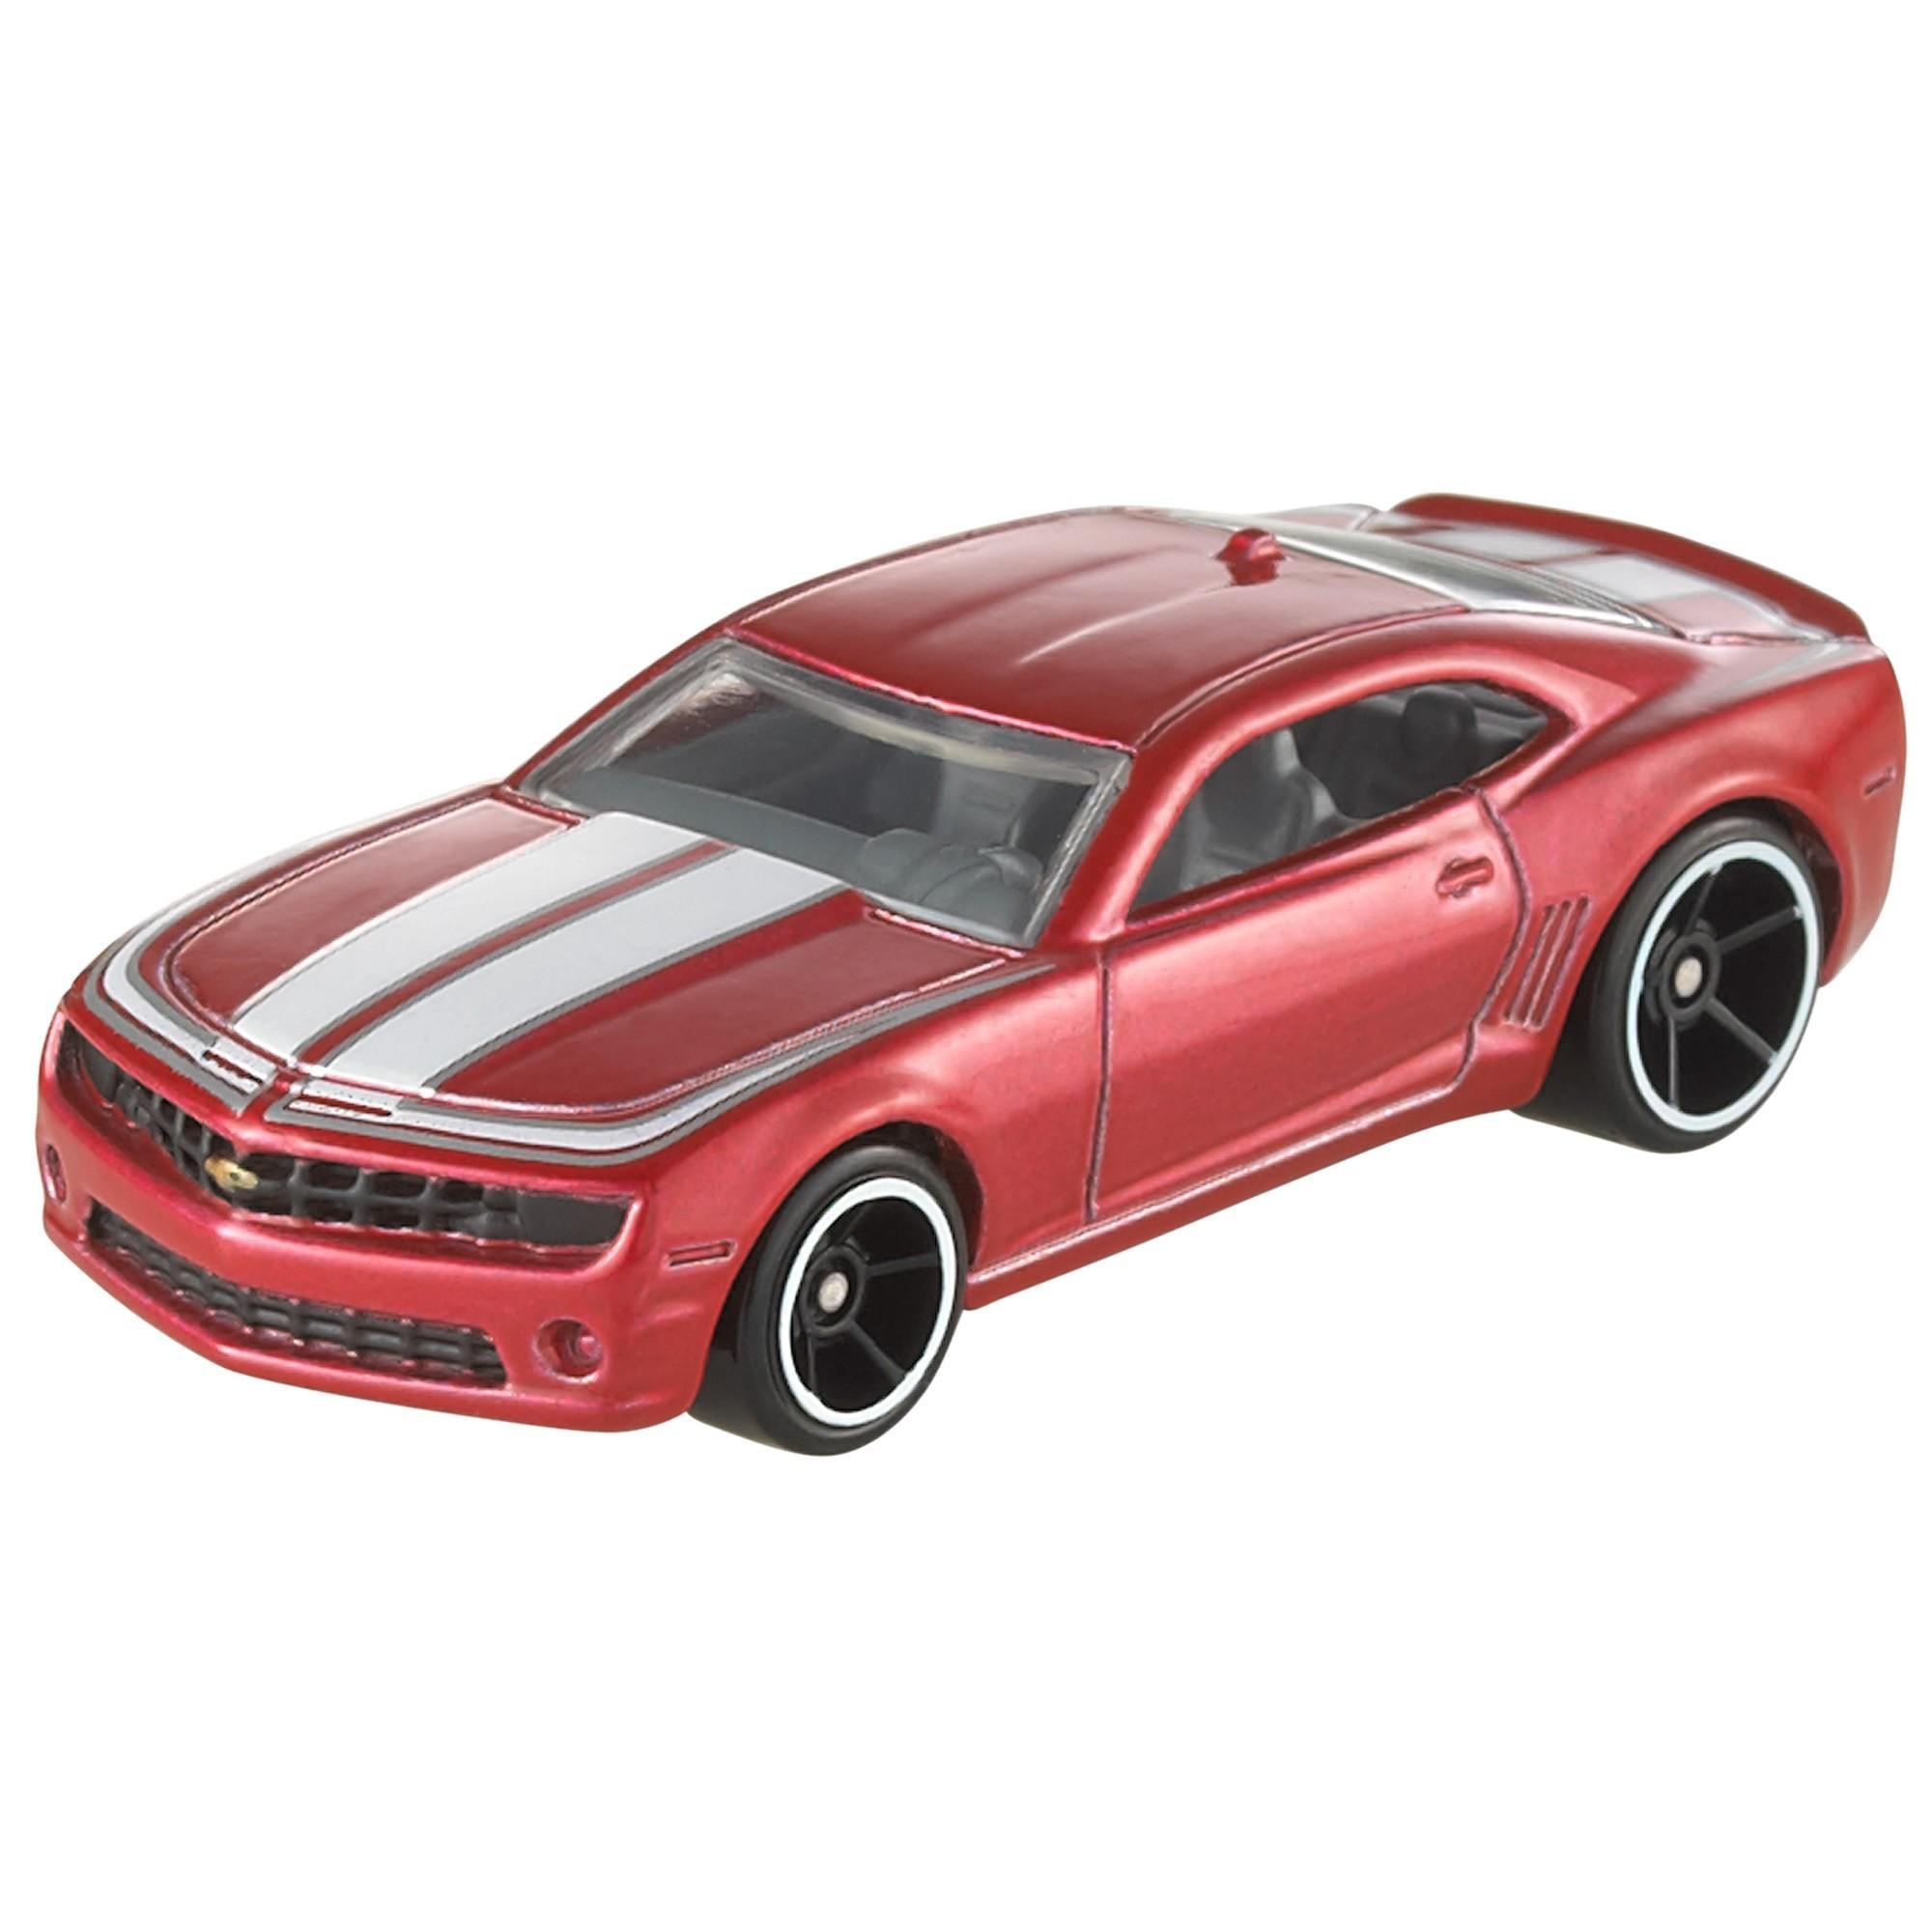 Hot Wheels 9 Die-Cast Car Gift Pack (Styles May Vary) - Walmart.com